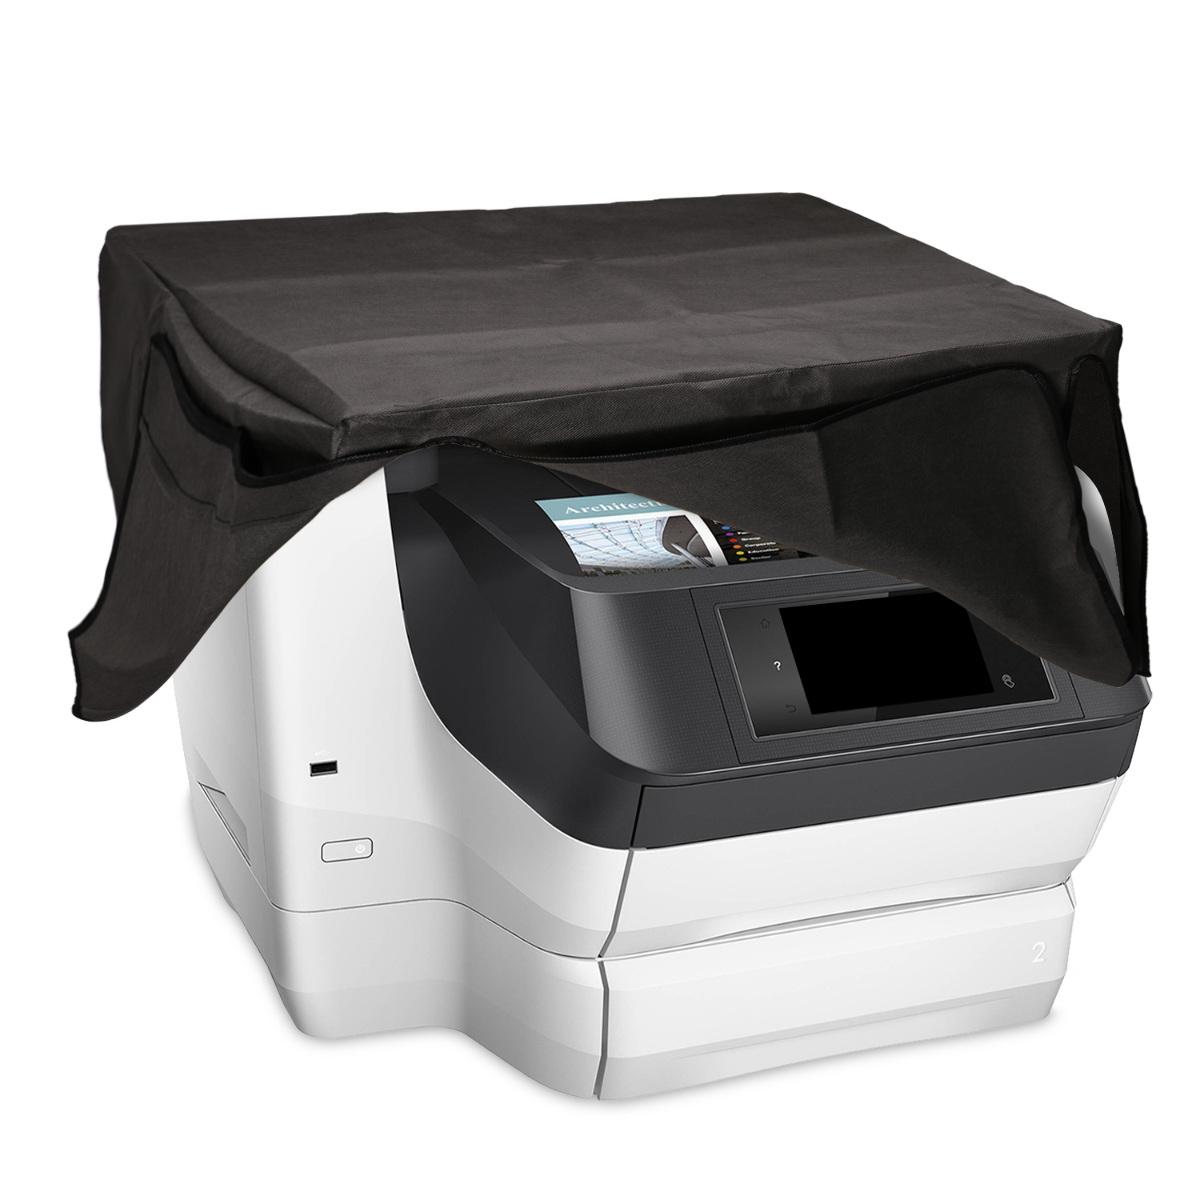 KW Κάλυμμα Εκτυπωτή HP Officejet Pro 8740/8745 - Dark Grey (49776.19)